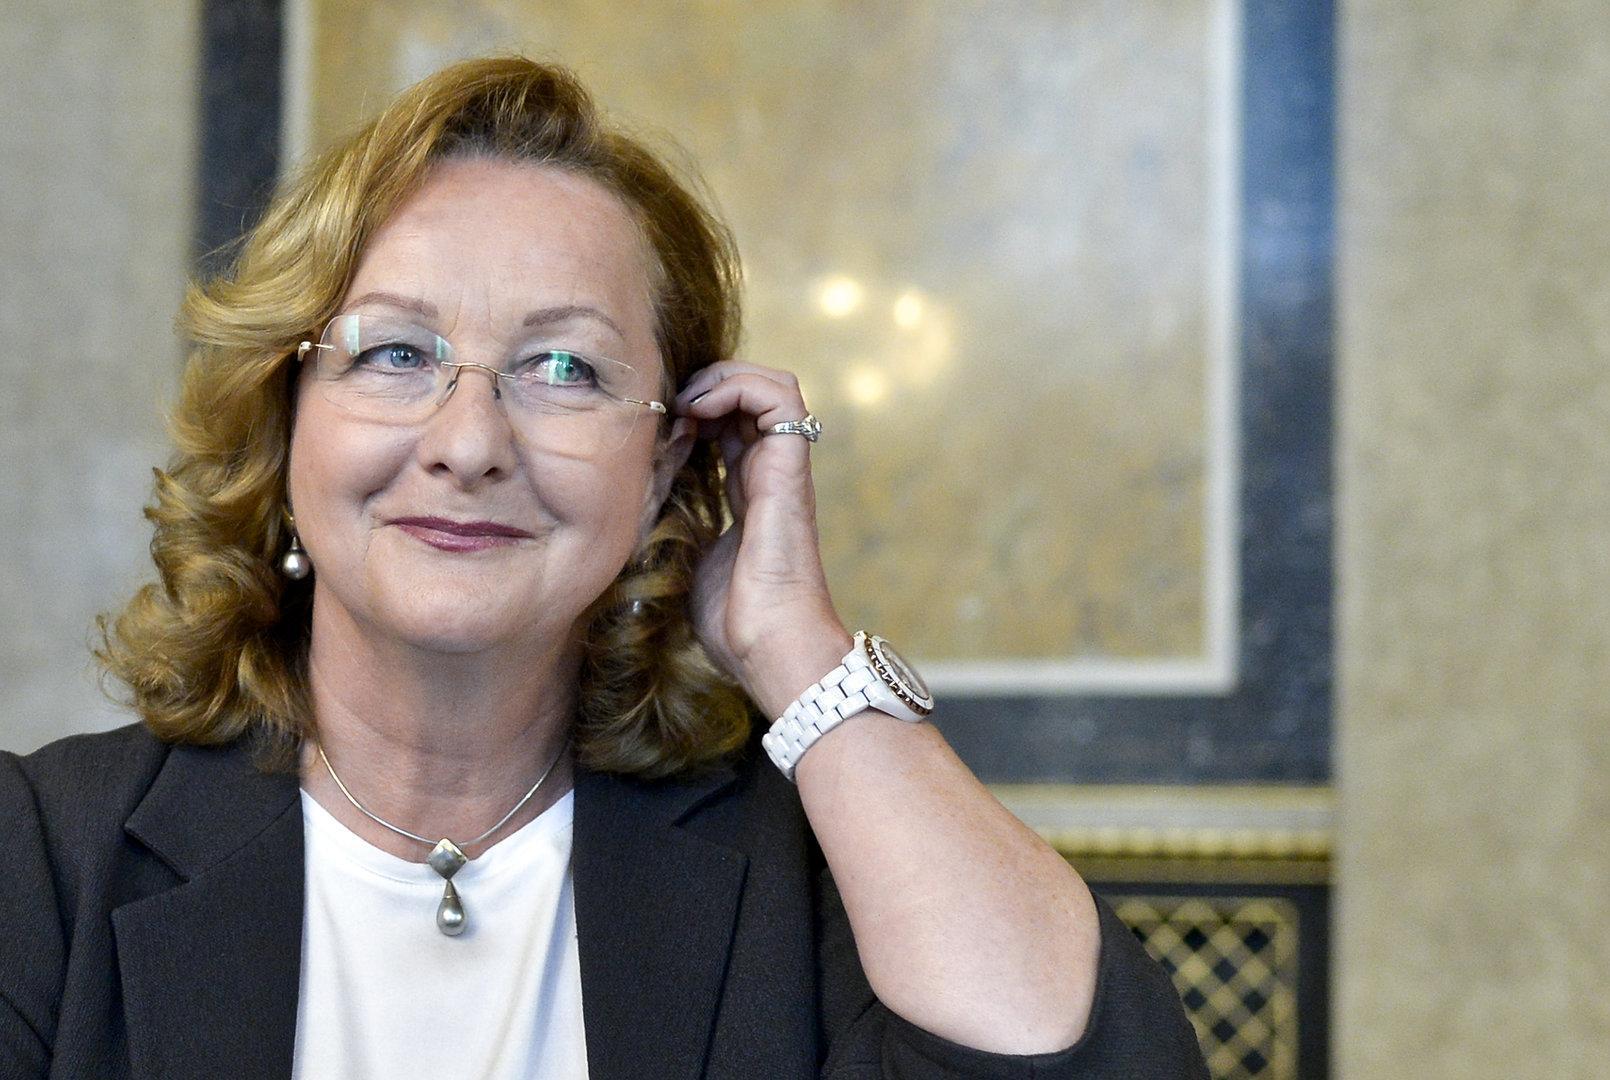 Pfunds anzeigen bekanntschaften, Wolfsberg partnervermittlung